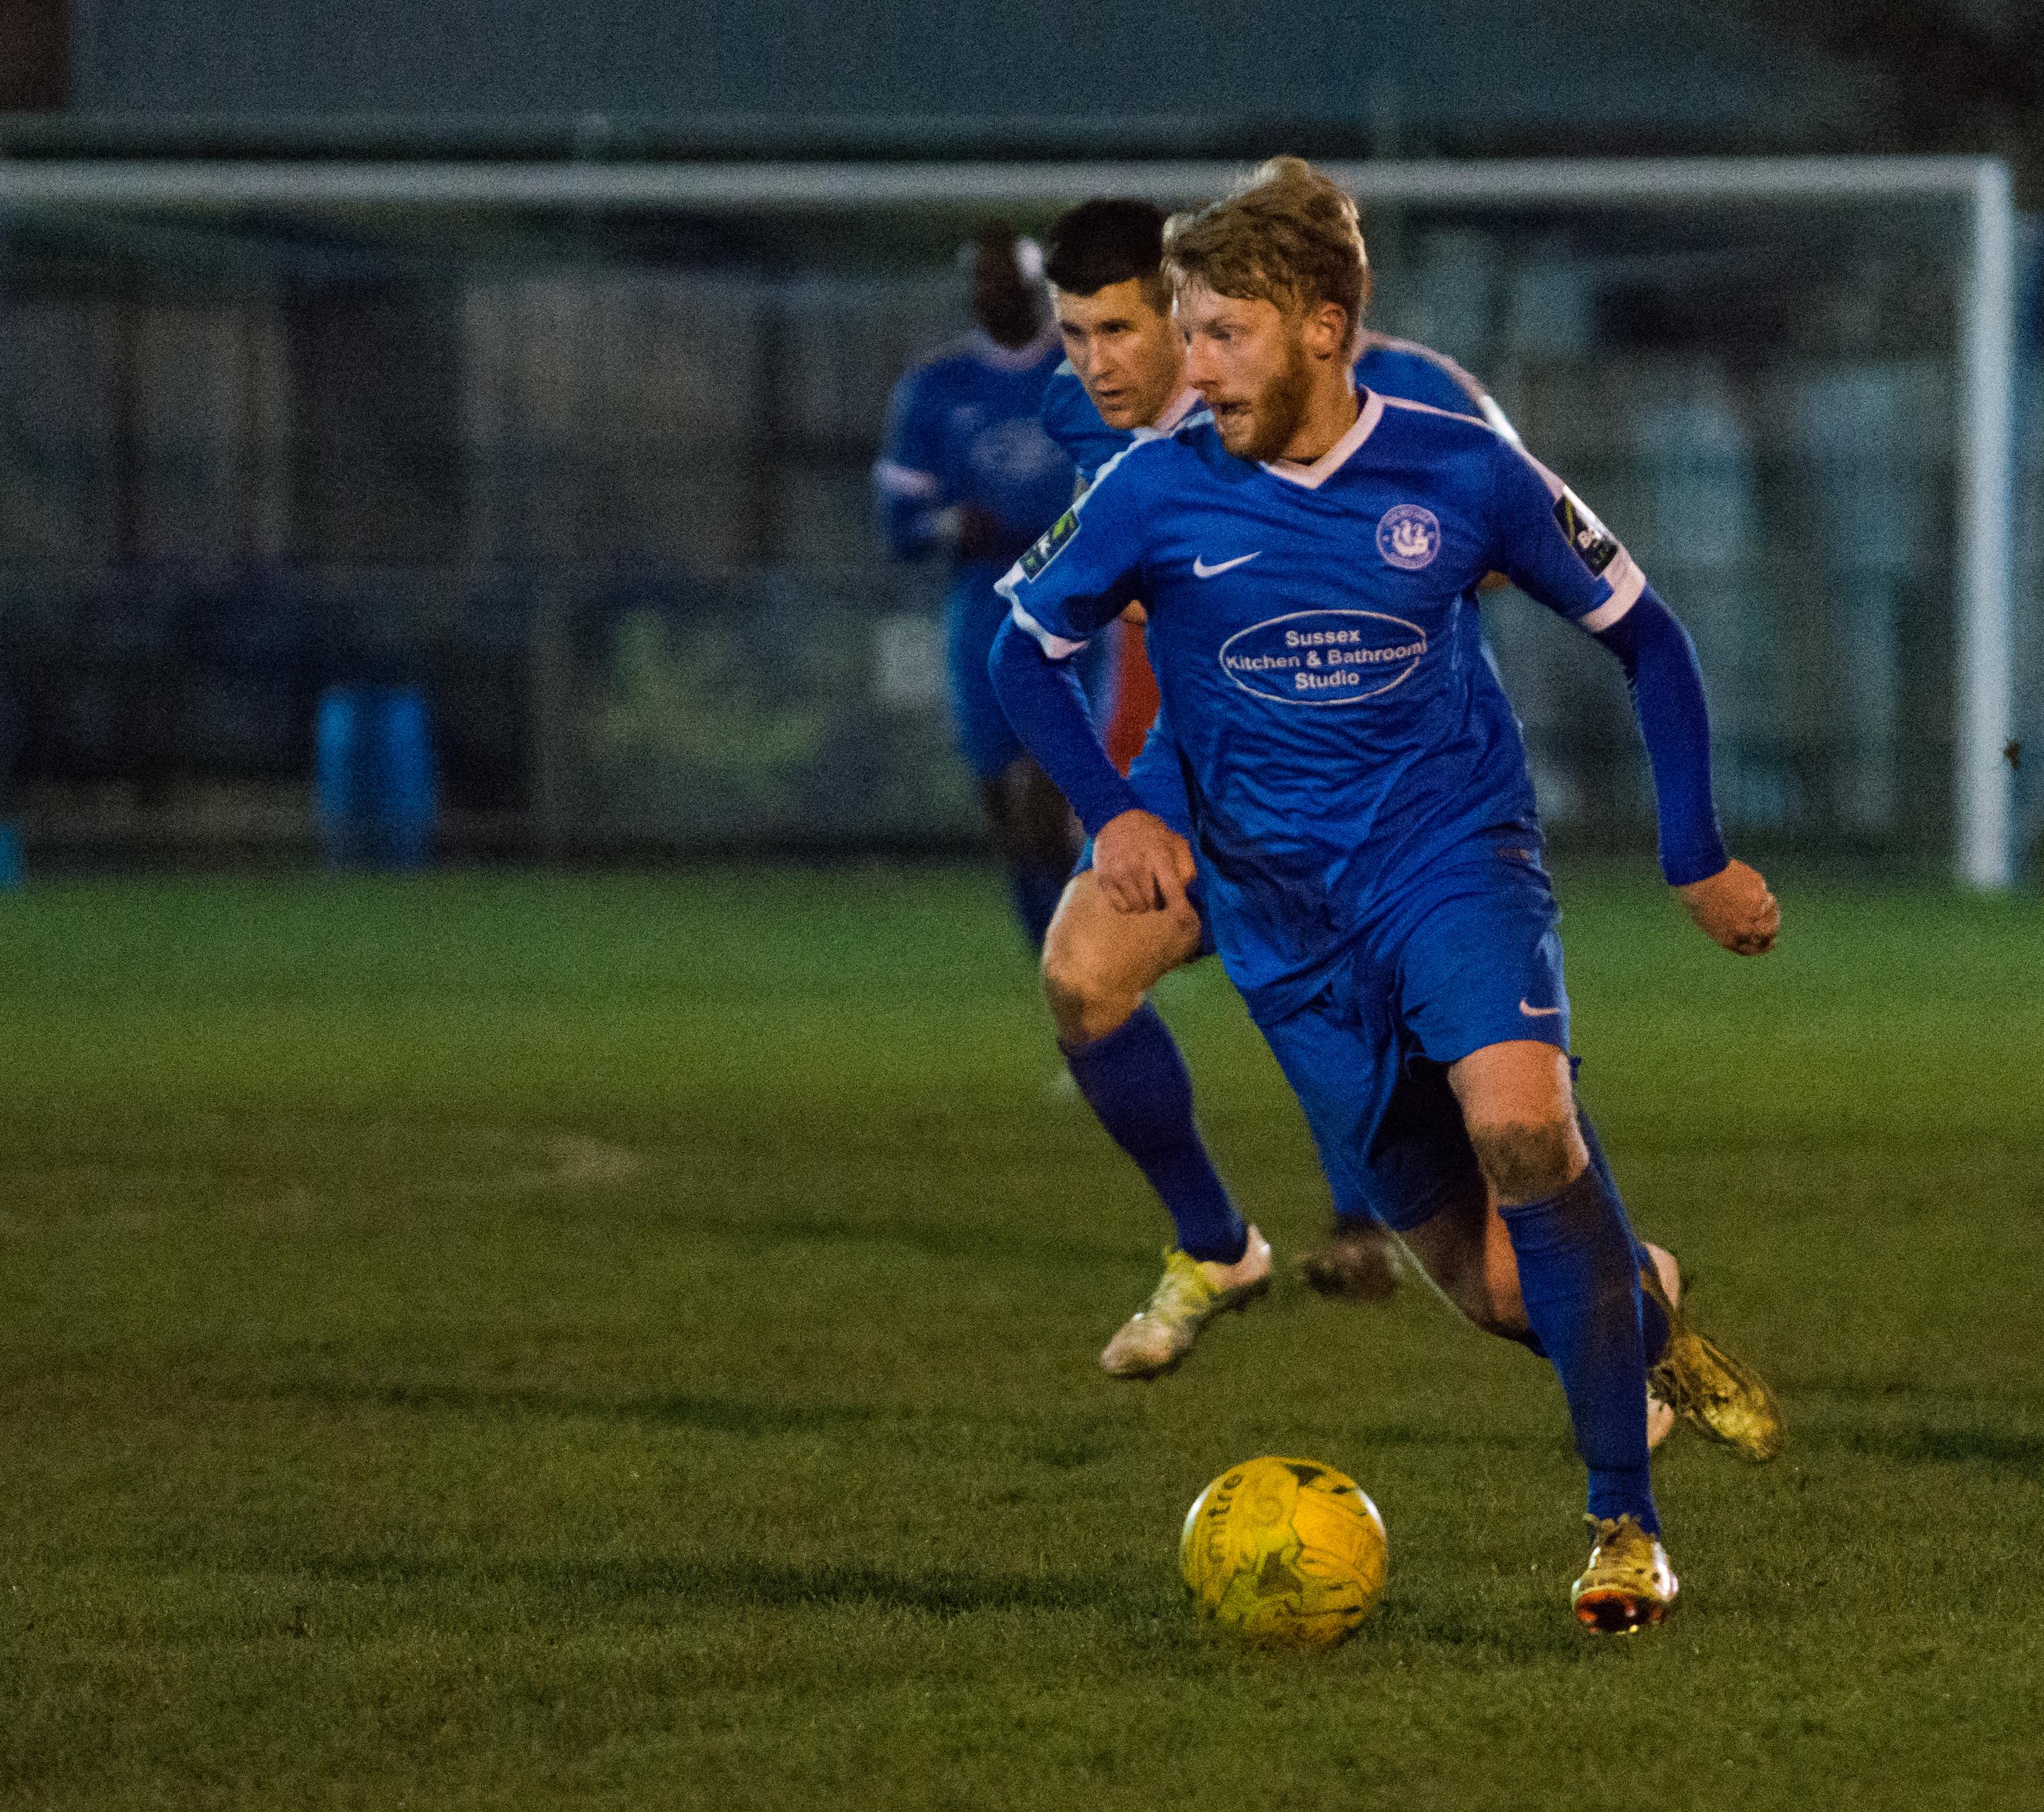 Shoreham FC vs Molesey FC 02.12.17 108